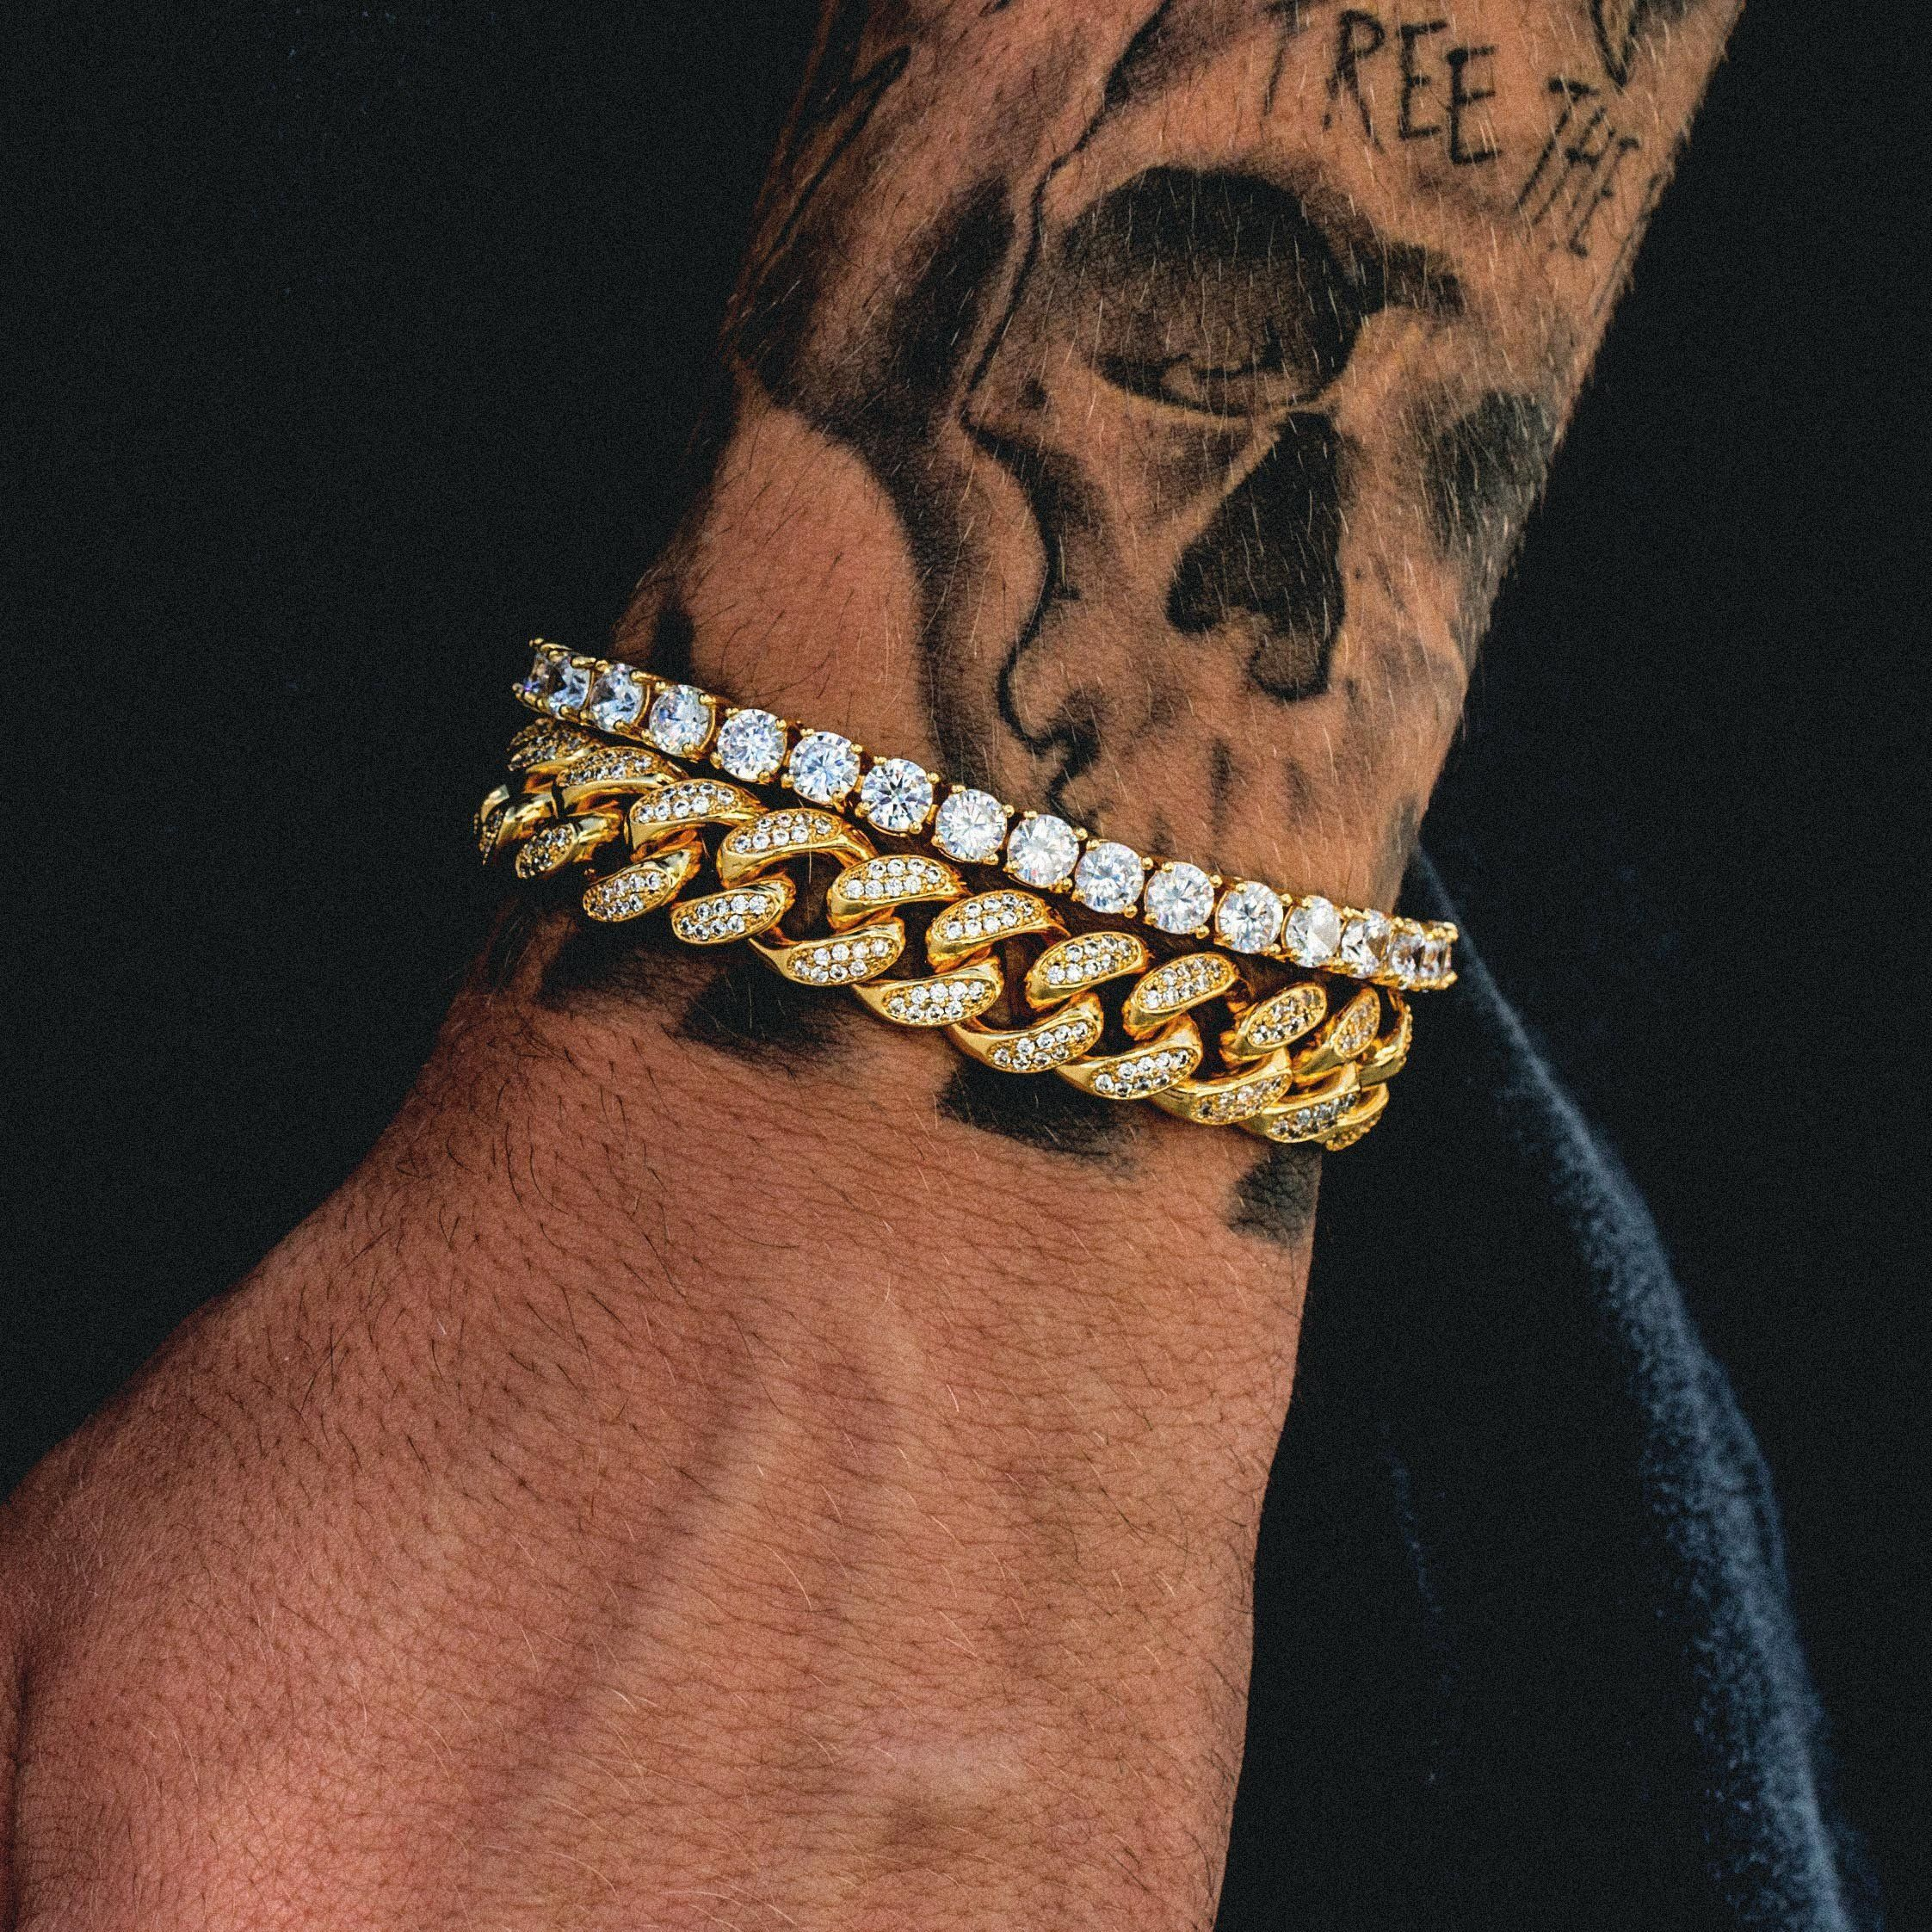 Diamond Cuban Link 10mm Tennis Bracelet Bundle Luxurydiamondbracelets Mens Diamond Bracelet Mens Jewelry Bracelet Bracelets For Men